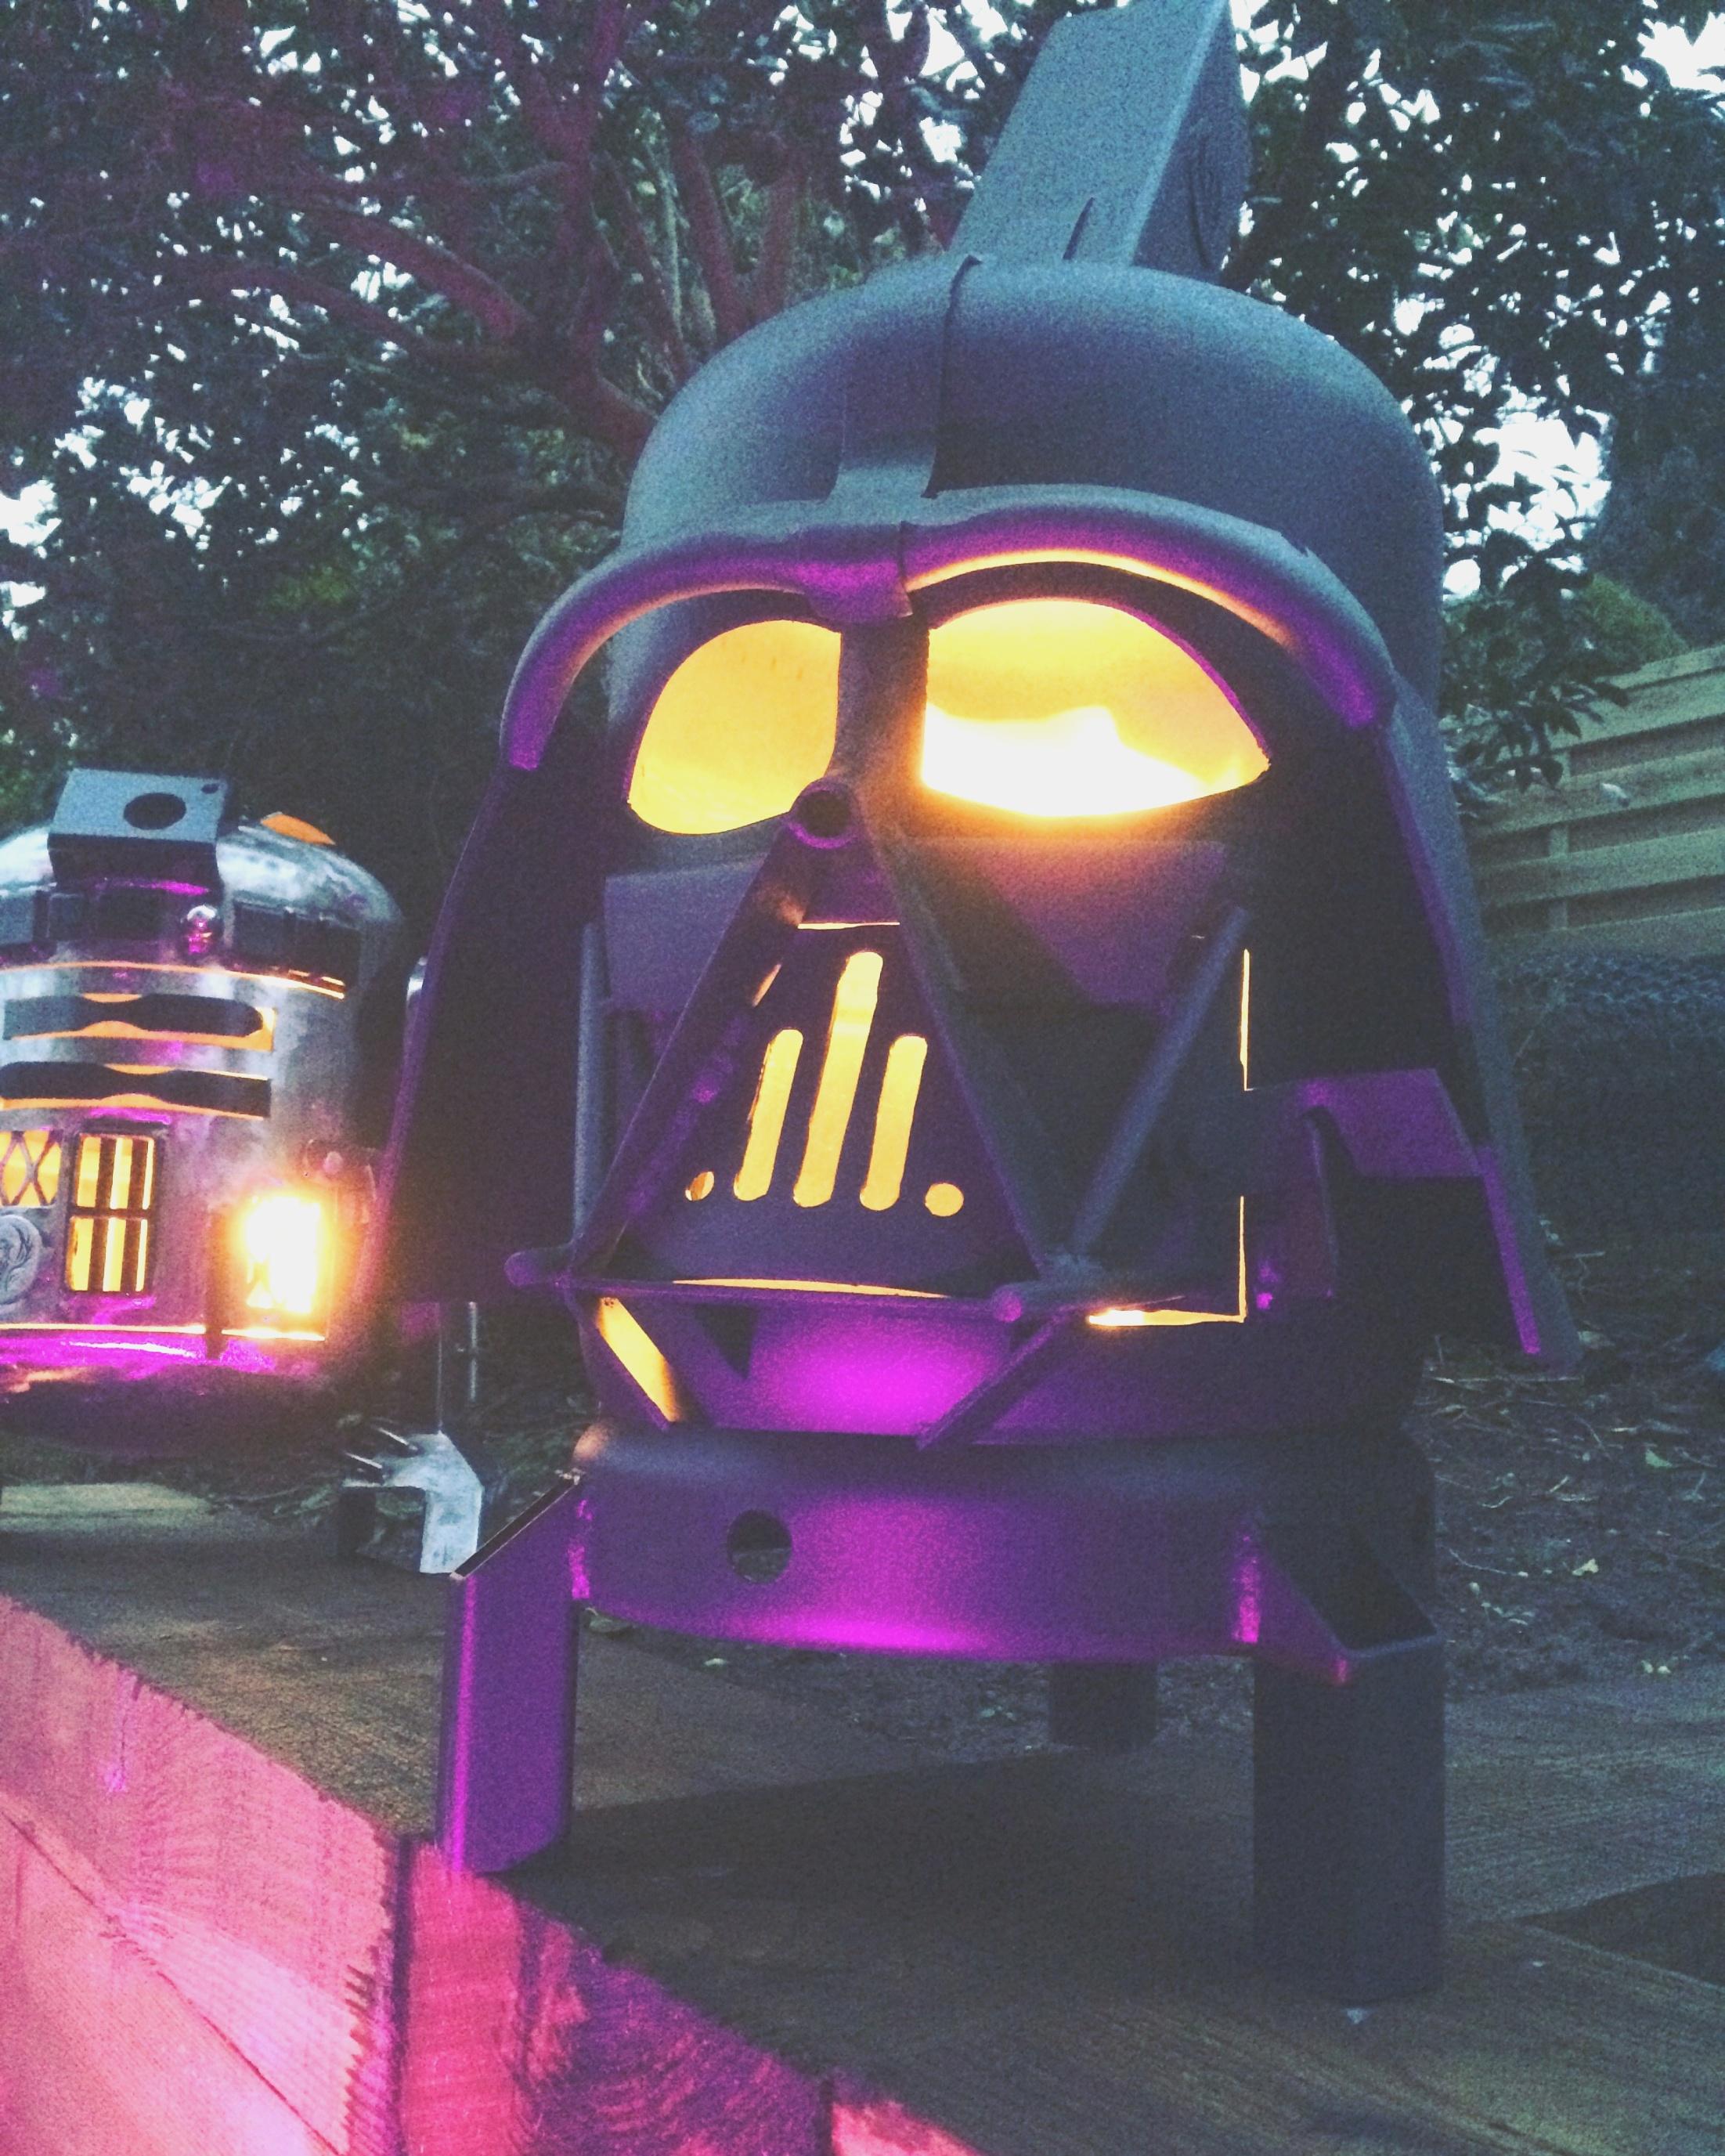 darth vader fire pit | Darth Vader Wood Burner | darth vader fire pit